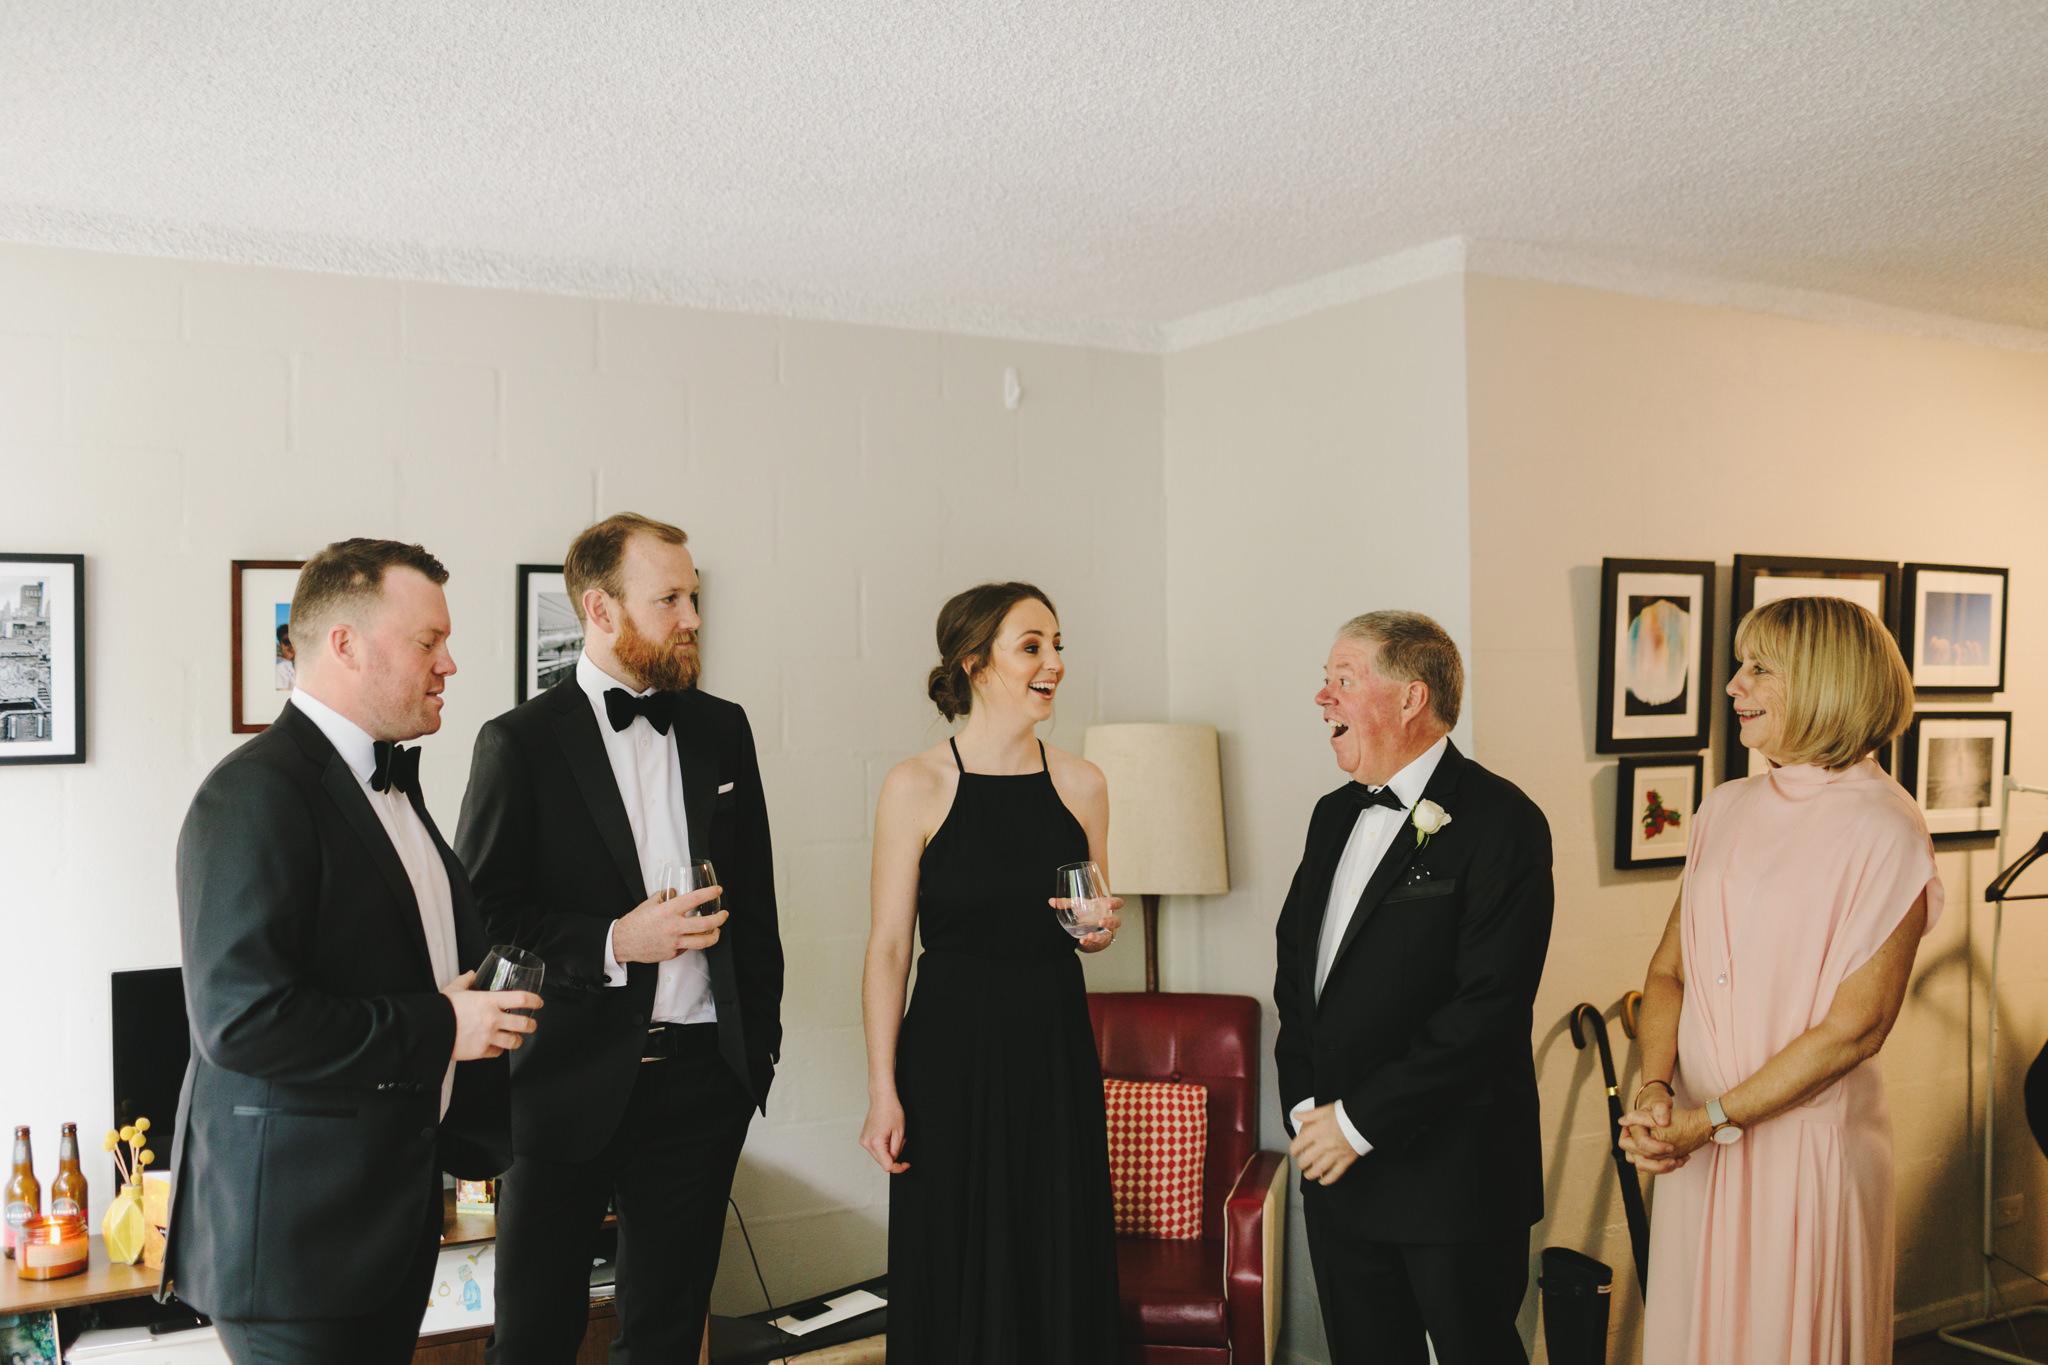 Abbotsford_Convent_Wedding_Peter_Anna005.JPG